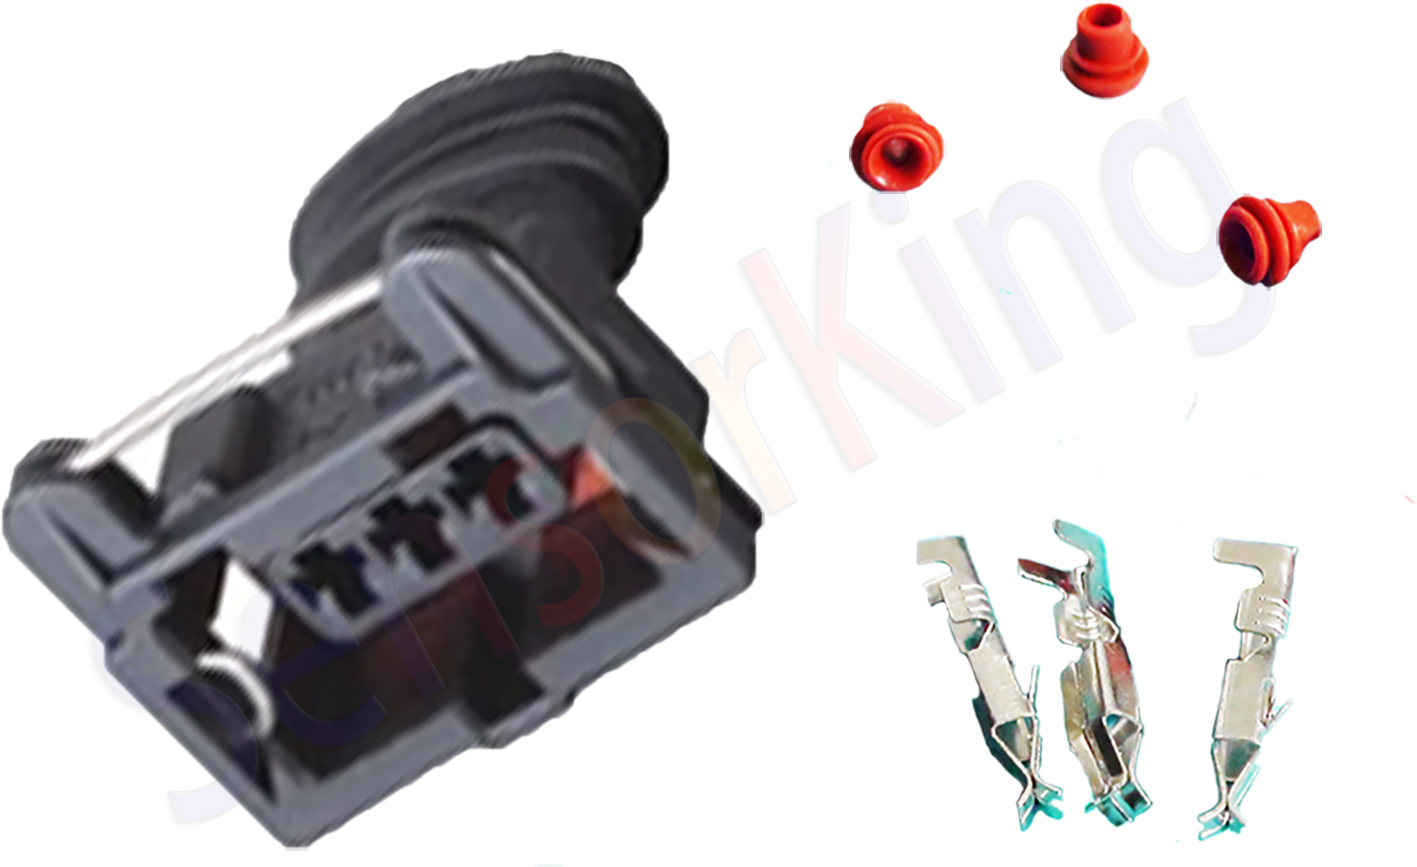 Stecker Sortiment Keenso 380 stk Steckergeh/äuse Elektrische Drahtklemmen Stecker Bullet Terminal Connector Sortiment Kit f/ür Motorrad Boote 40 S/ätze 2,8mm 2 3 4 6 Pin Auto Fahrrad